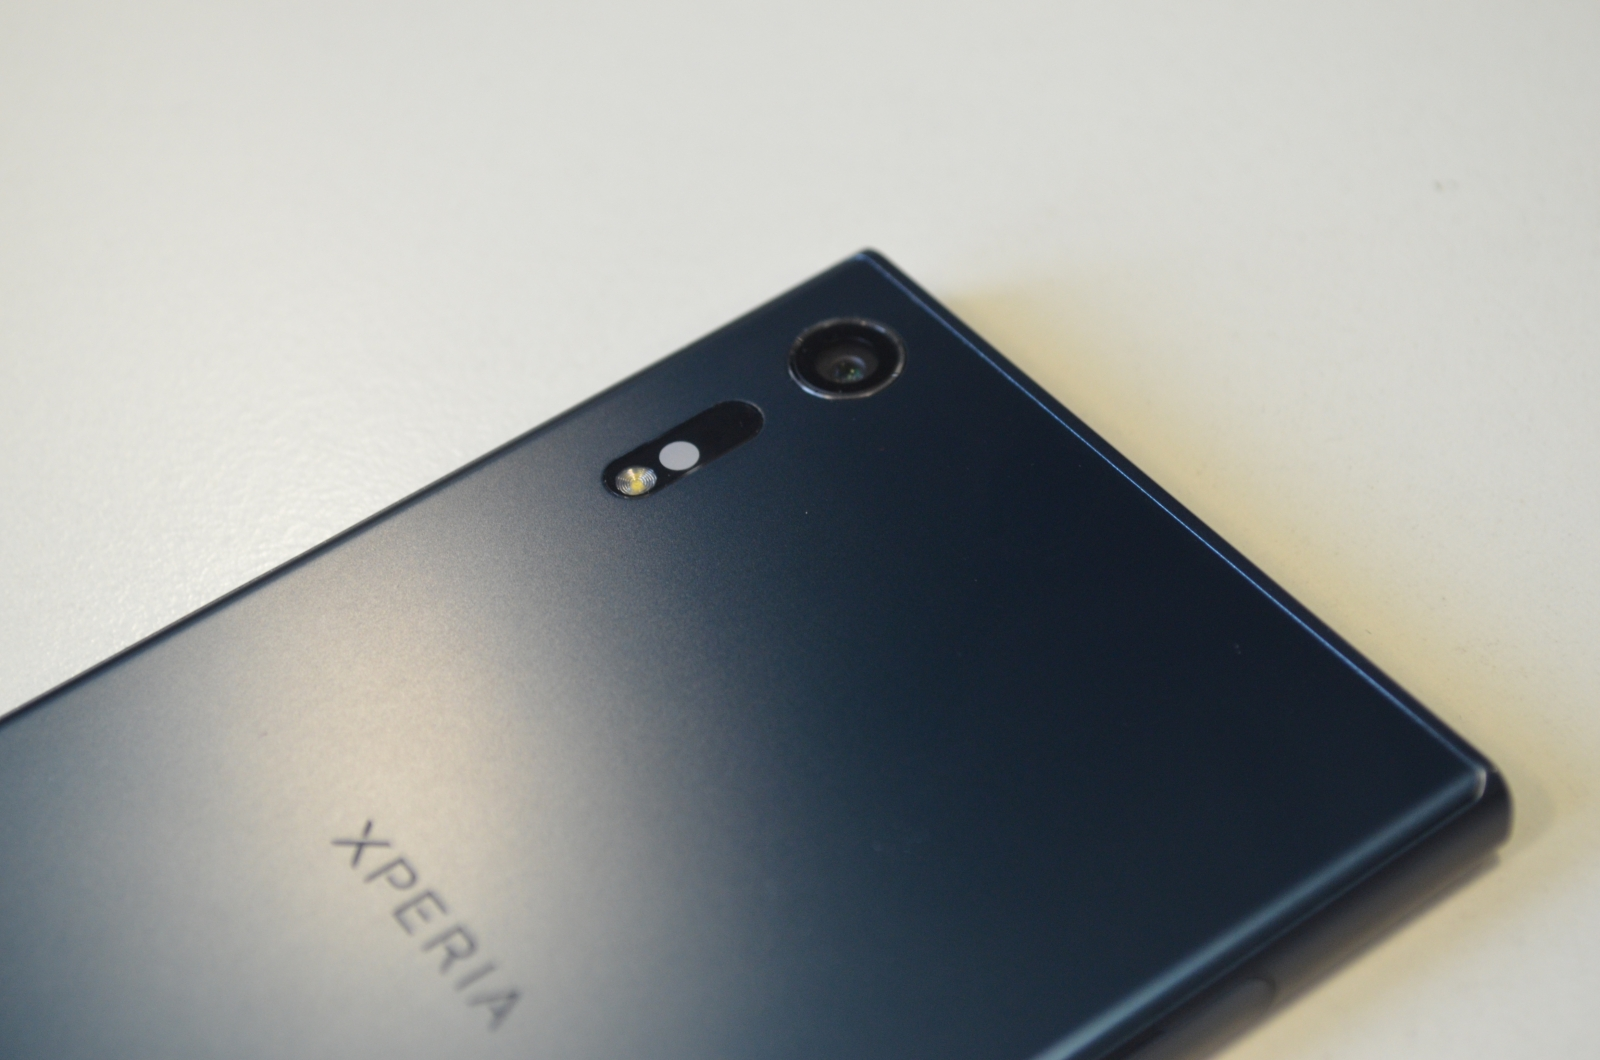 Sony Xperia XZ review camera